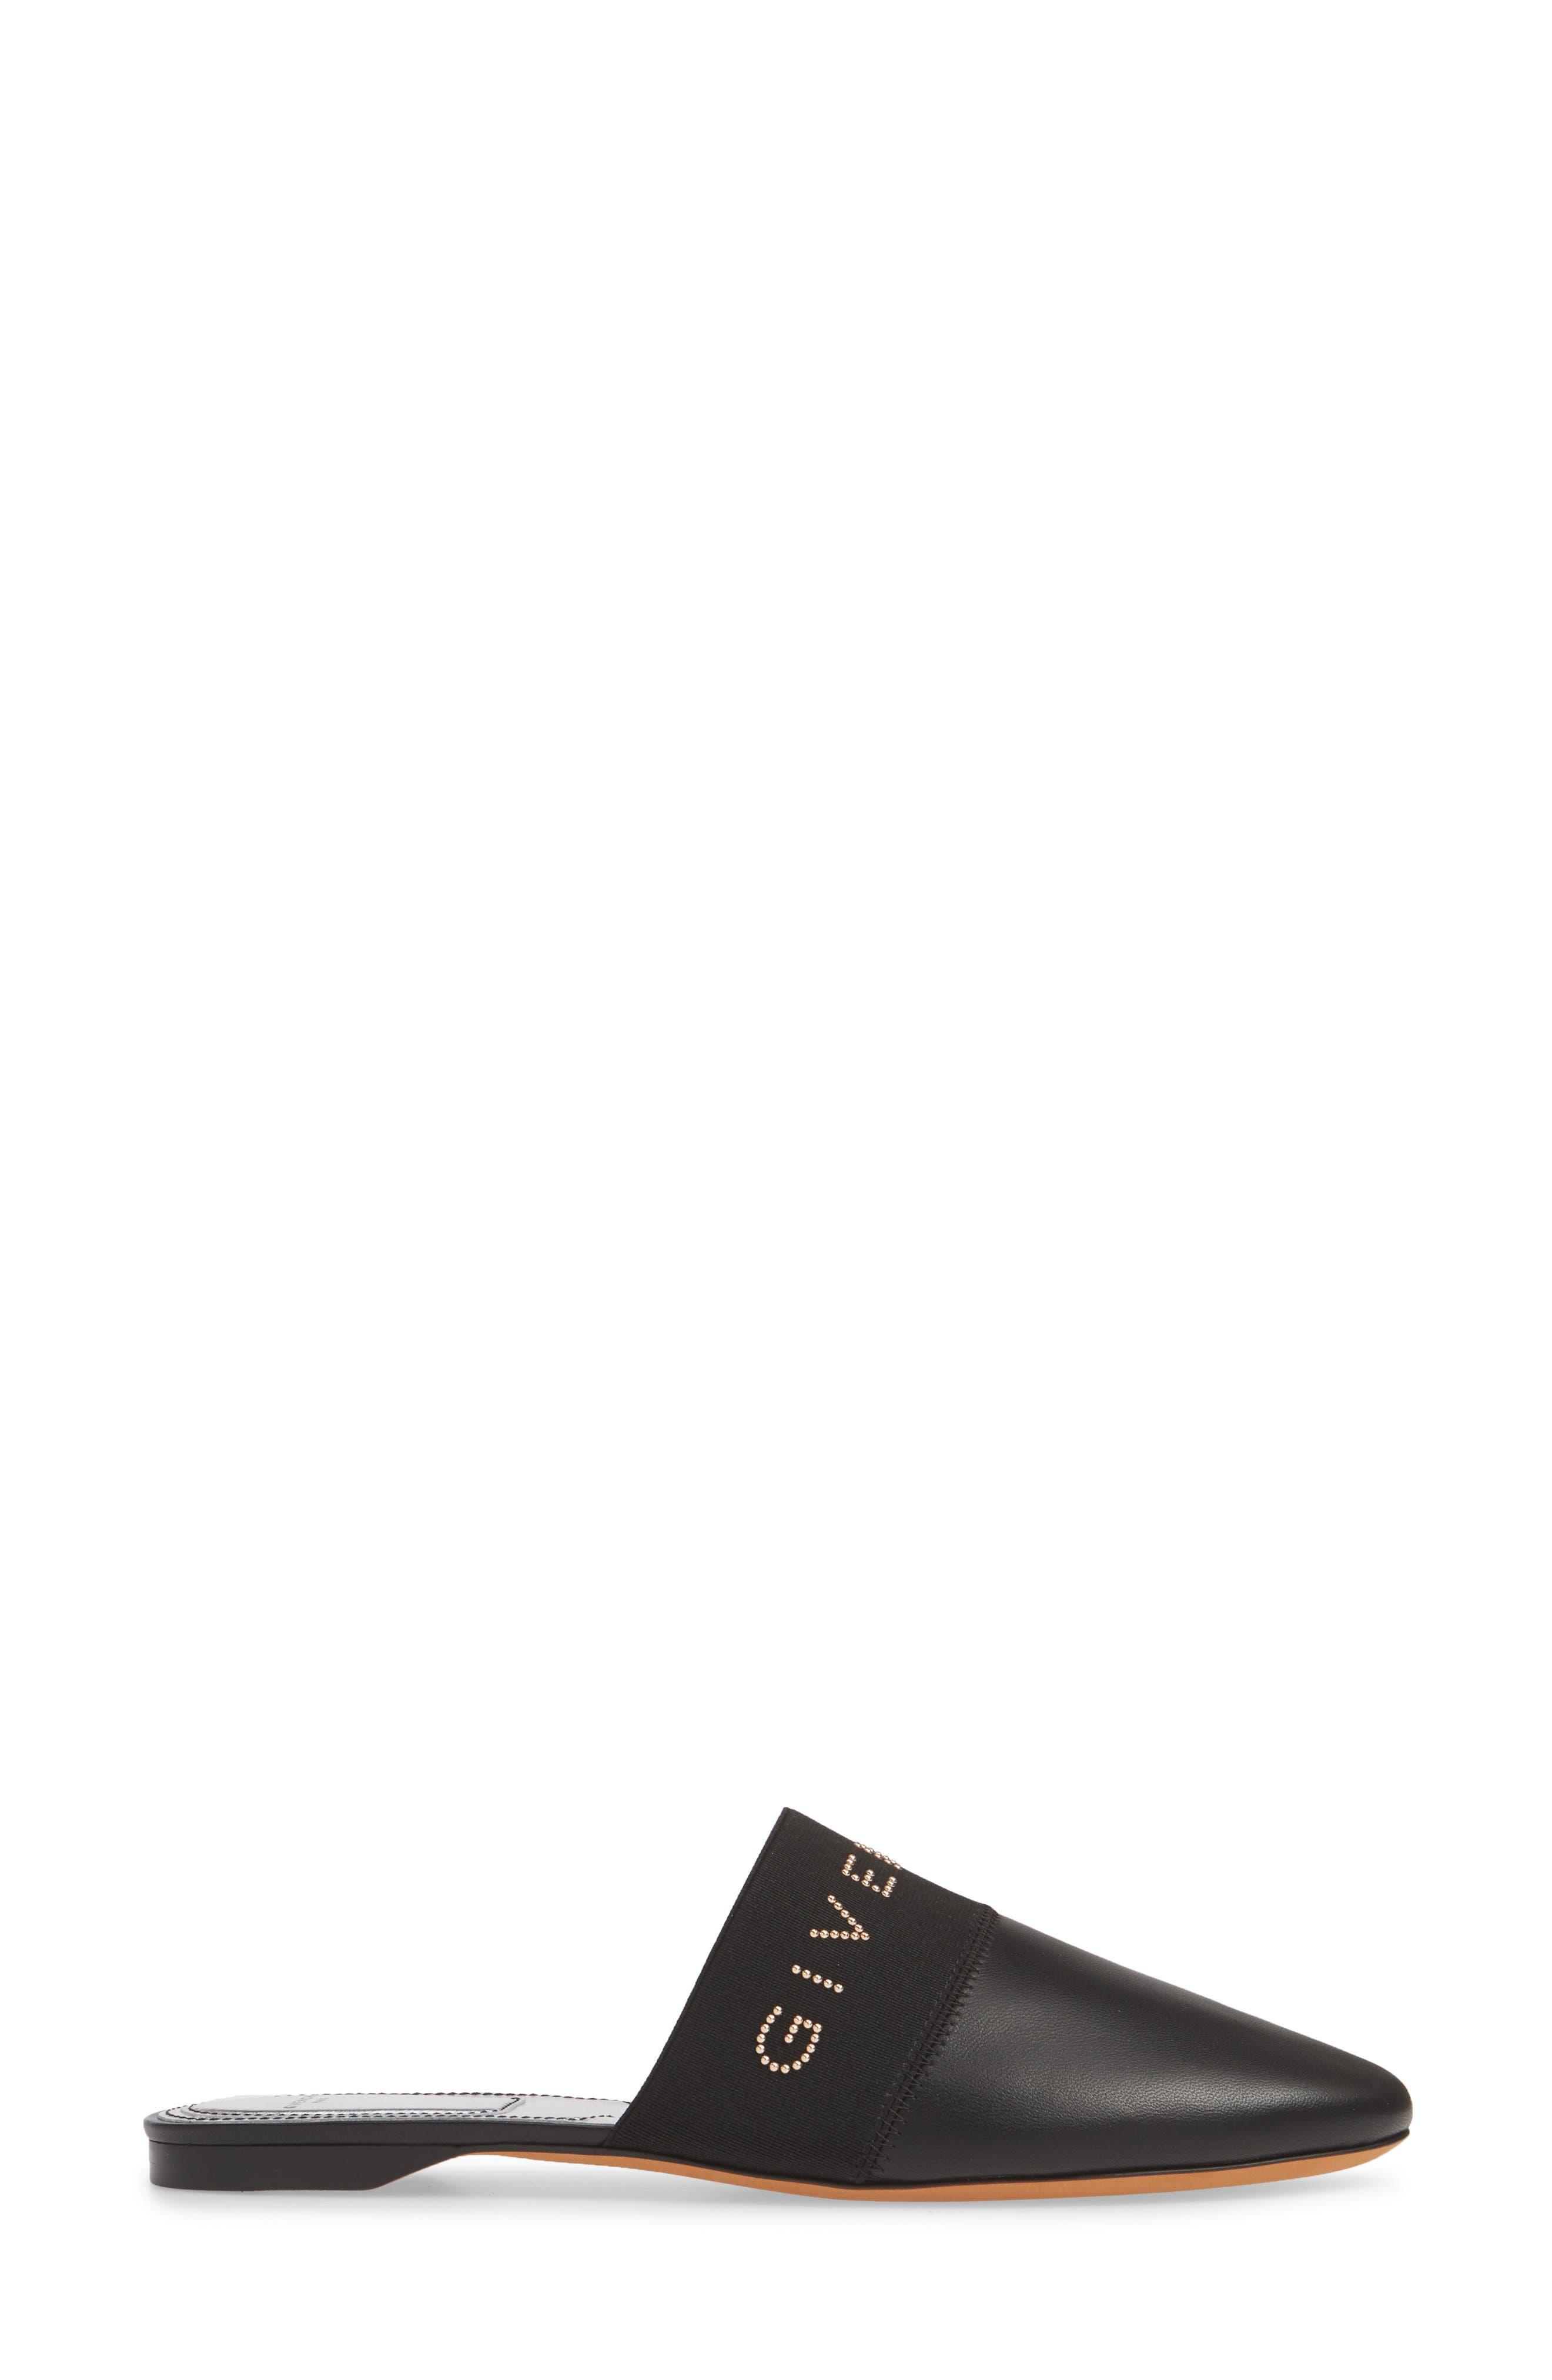 GIVENCHY,                             Bedford Logo Mule,                             Alternate thumbnail 3, color,                             BLACK/ GOLD